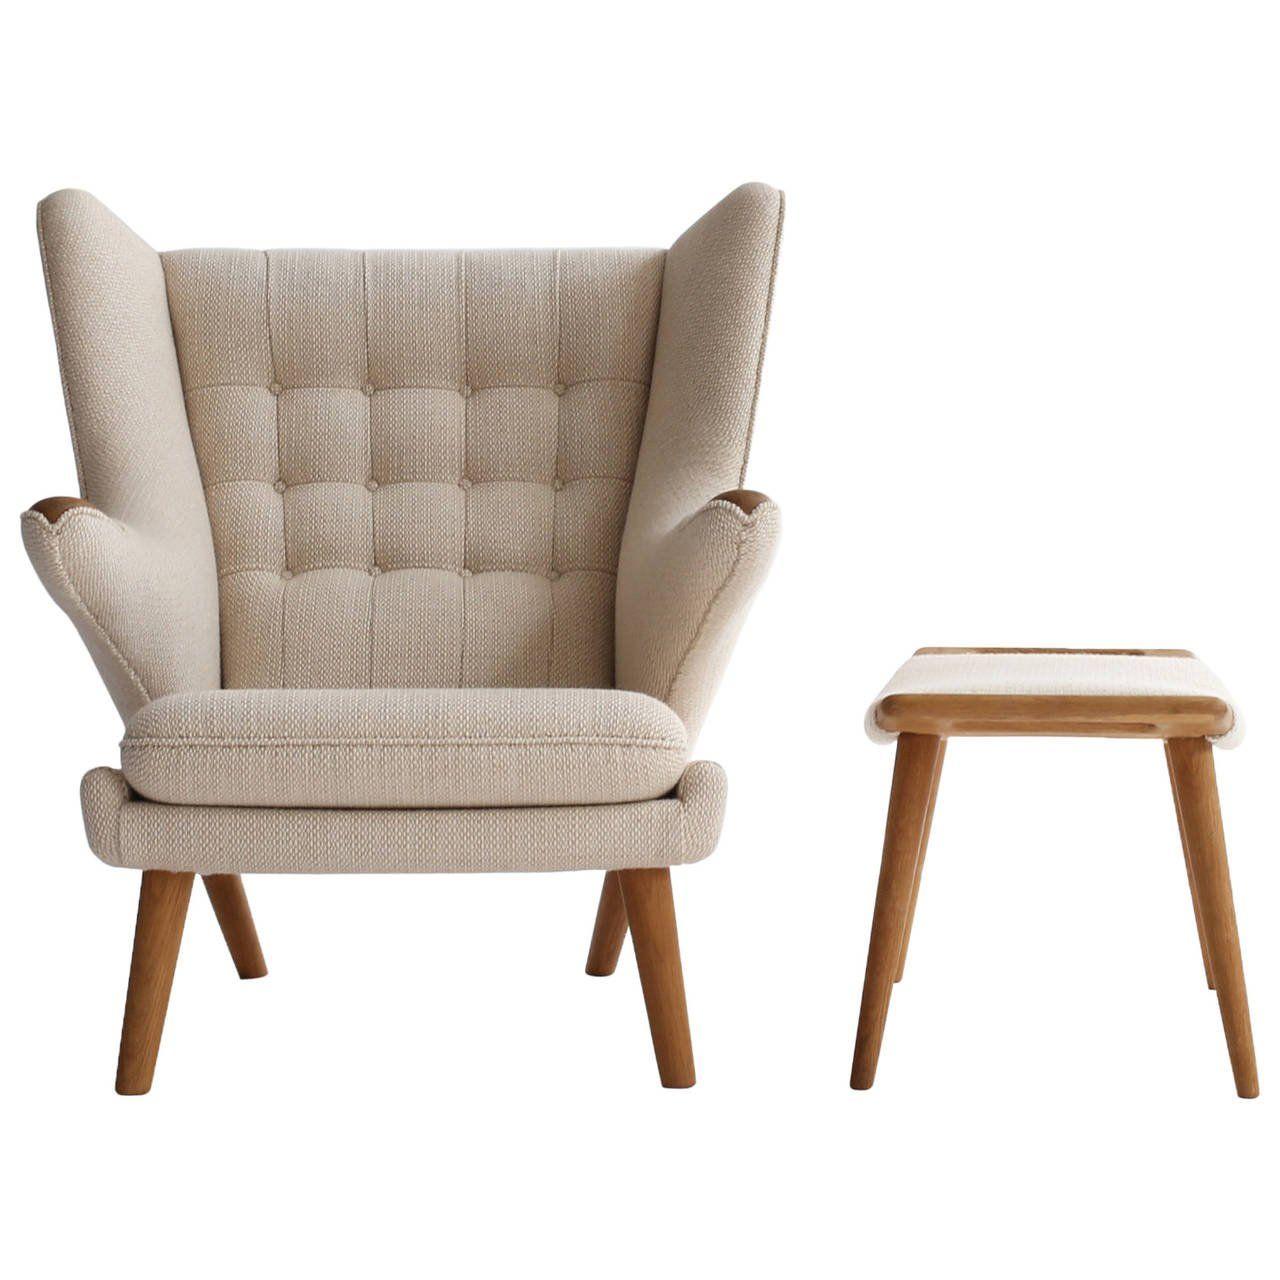 Vintage Hans J. Wegner Papa Bear Chair With Stool 1